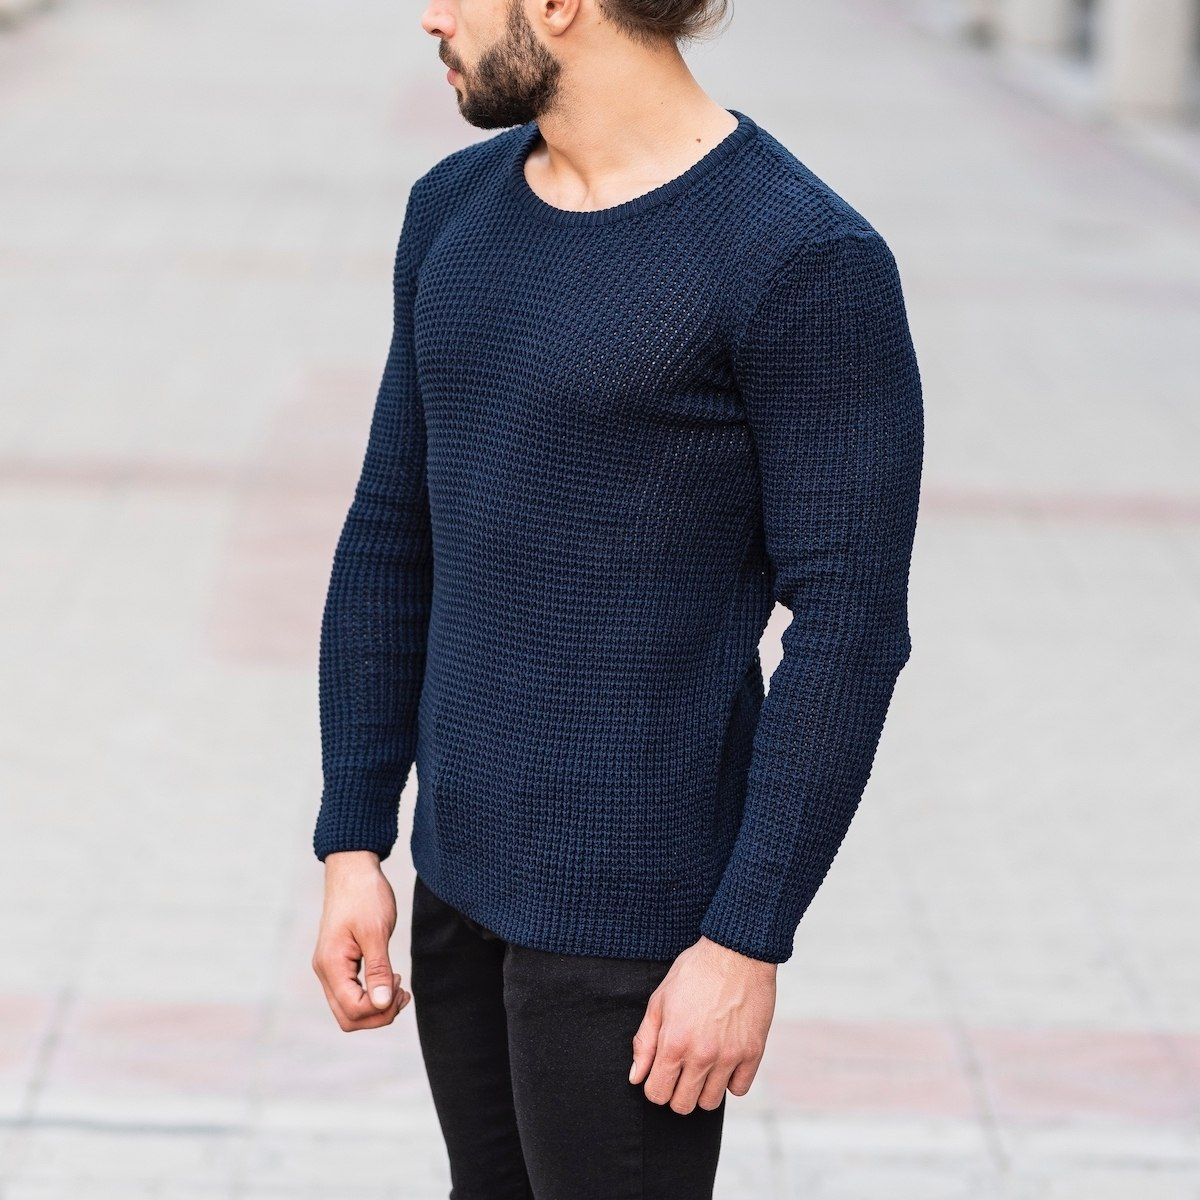 Knitted Pullover In Navy Blue Mv Premium Brand - 3